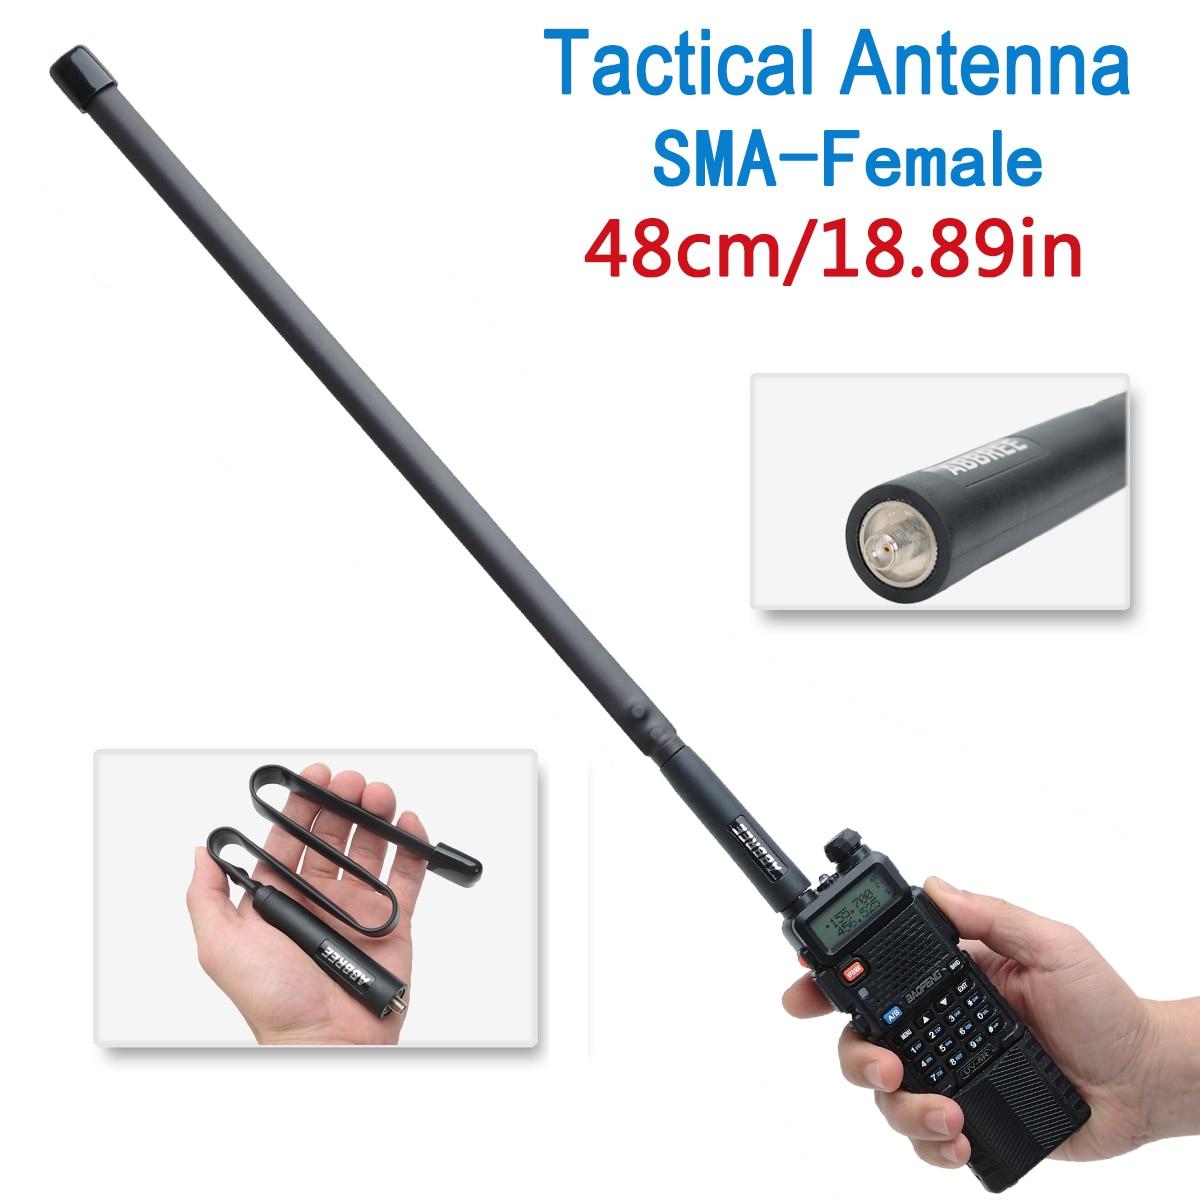 ABBREE AR-152 táctico antena plegable SMA-hembra VHF UHF 144/430Mhz para Walkie Talkie Baofeng UV-82 UV-5R UV 5R BF-888S AR-F8